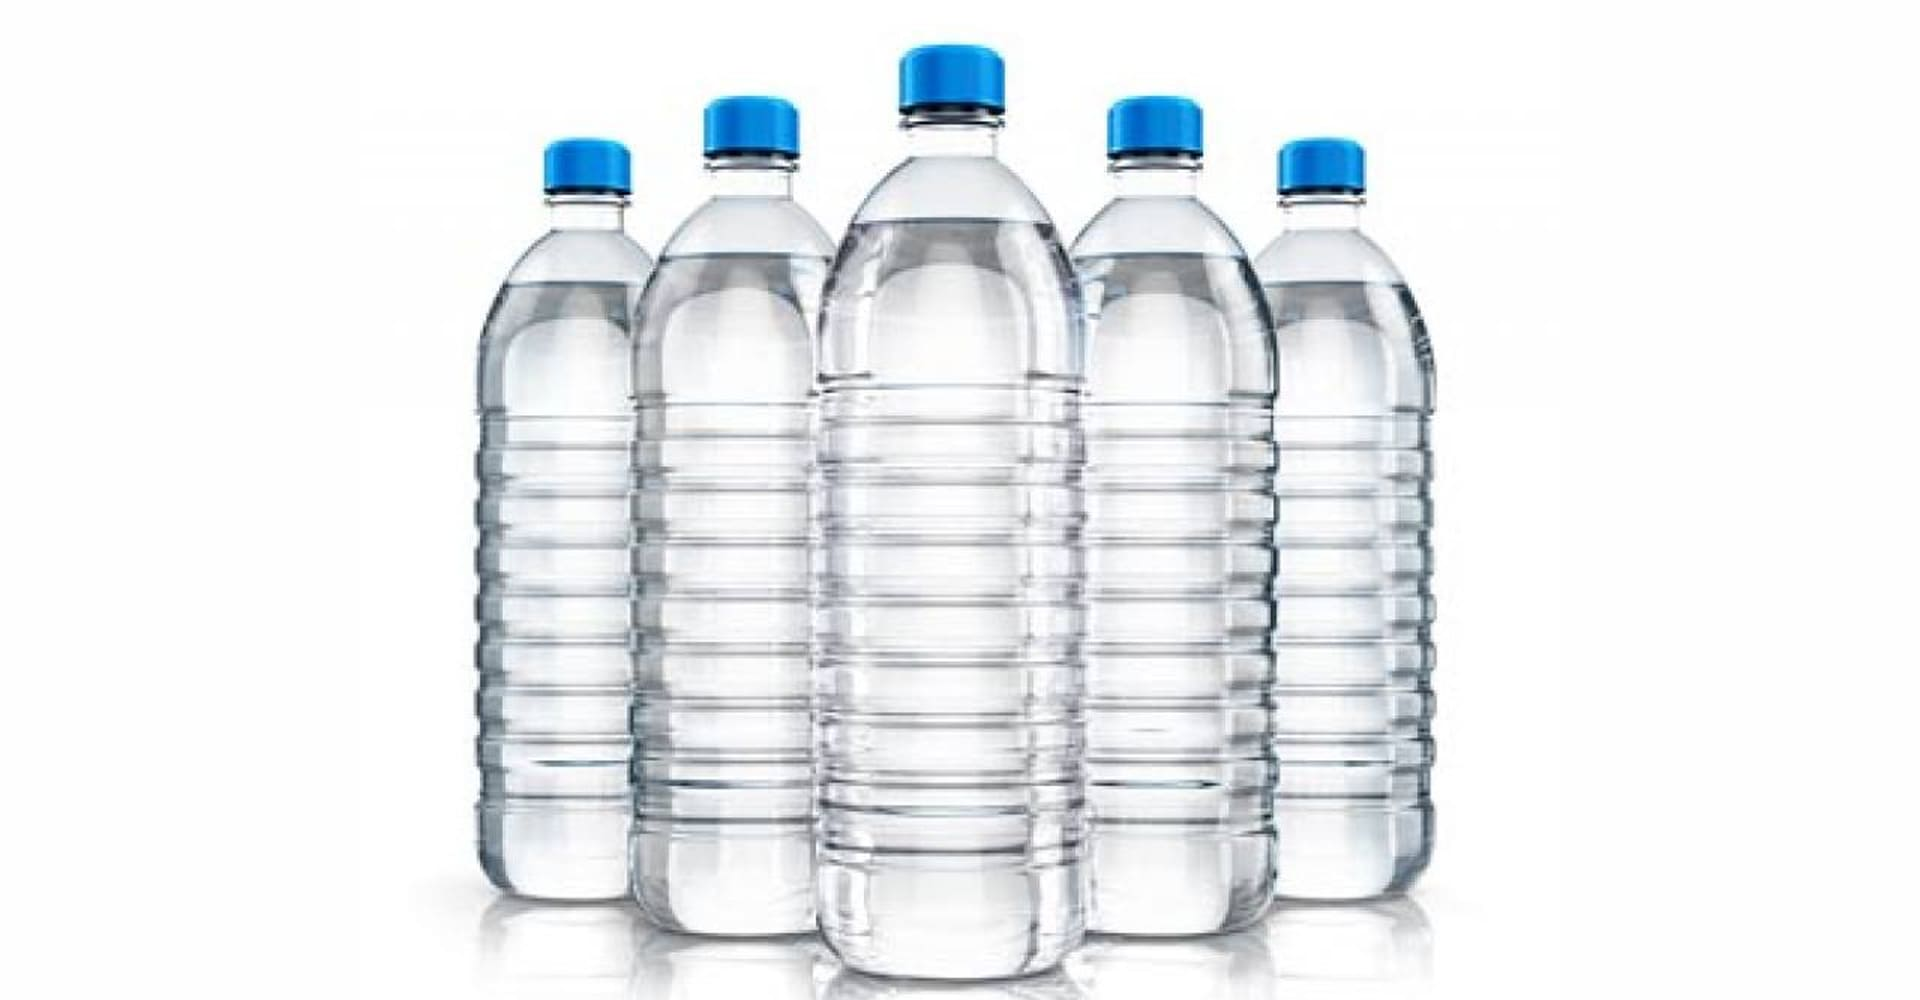 ¿Por qué contamina tanto tomar agua embotellada?